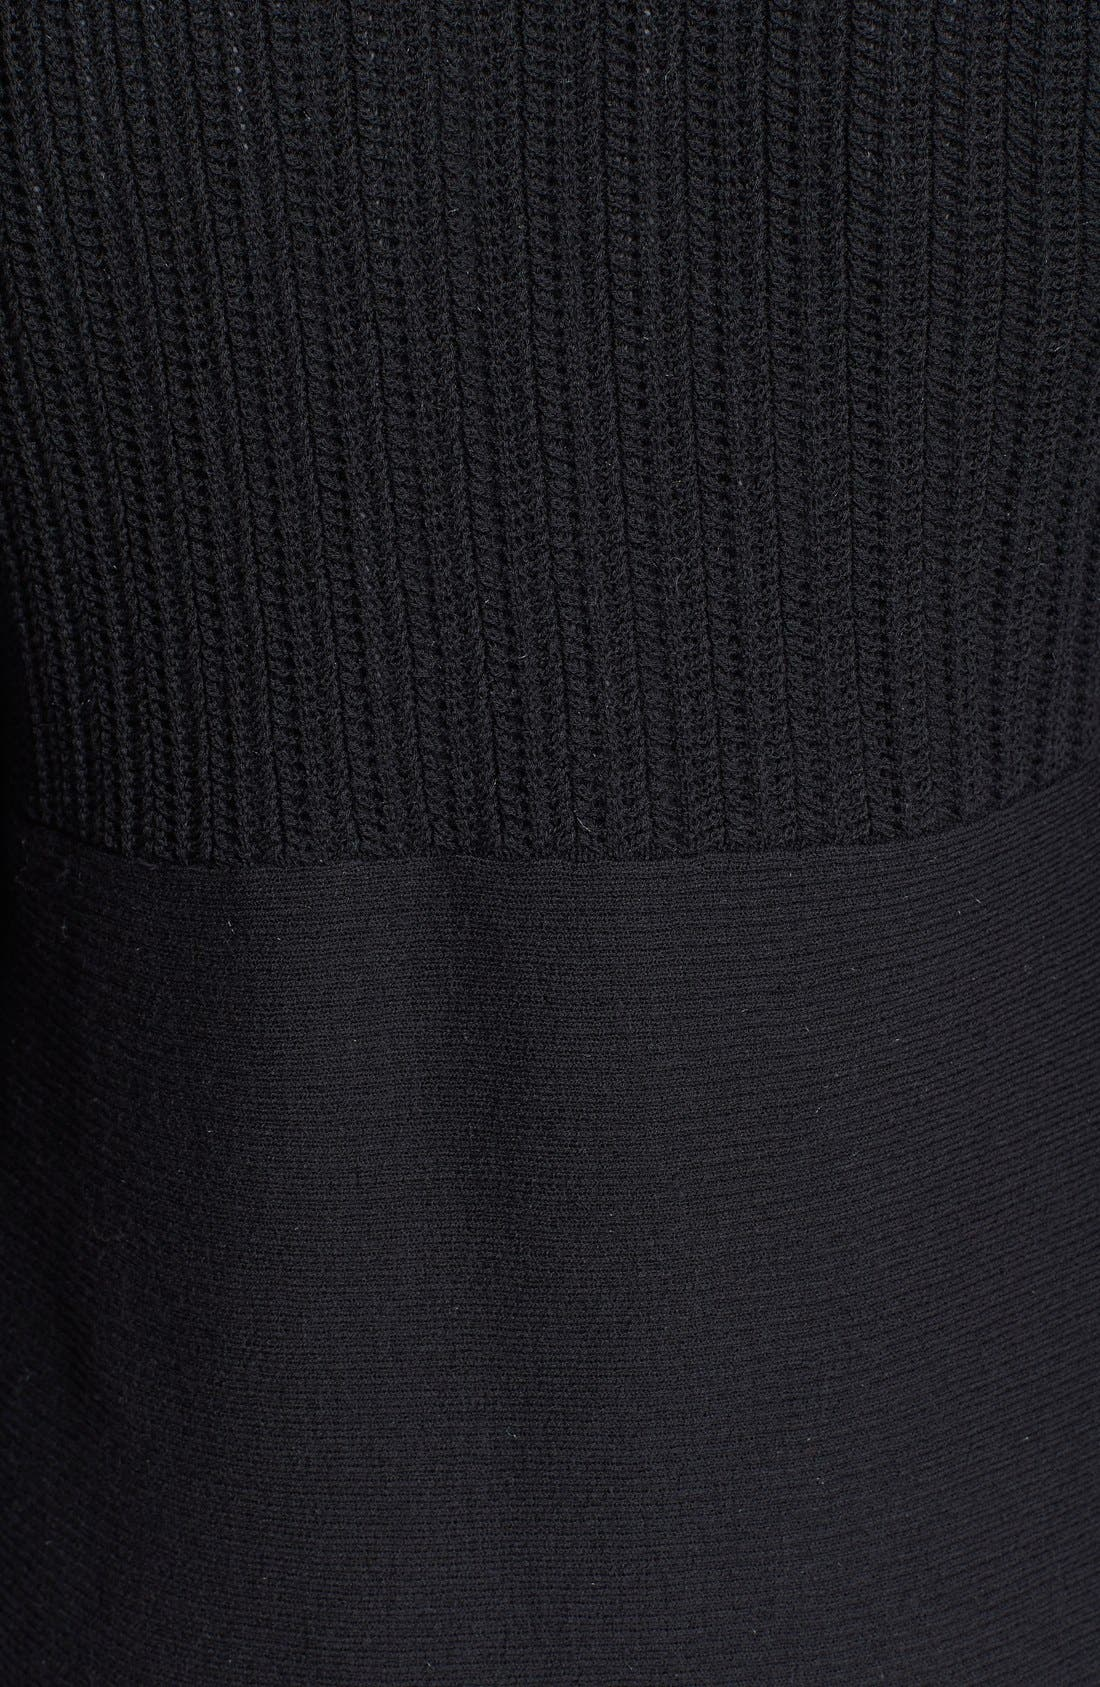 Alternate Image 3  - Eileen Fisher Textured Wool Cardigan (Petite)